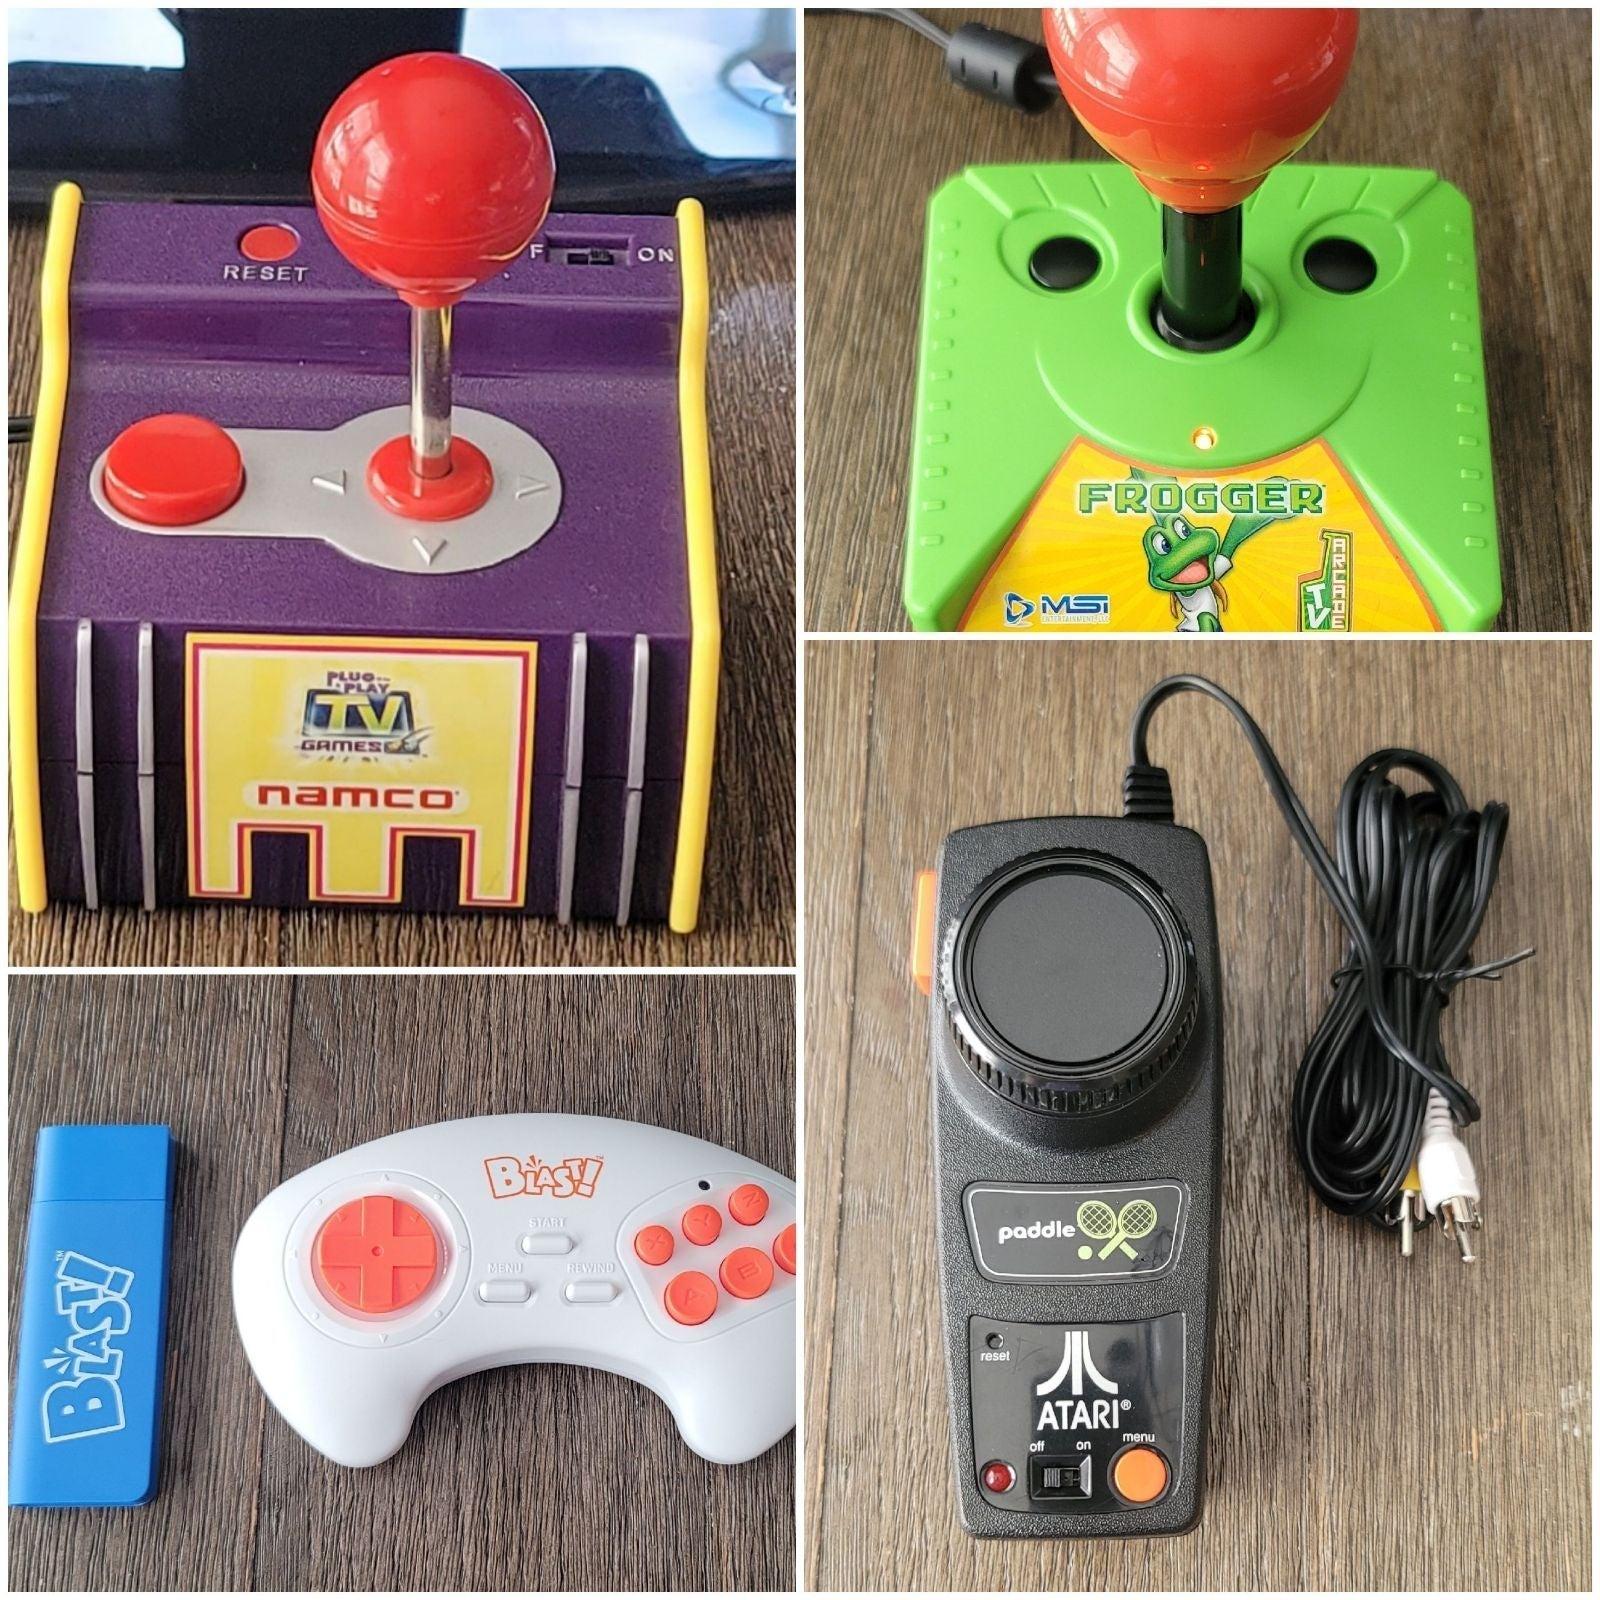 Pac-Man/Frogger/Atari Flashback 2/Legend